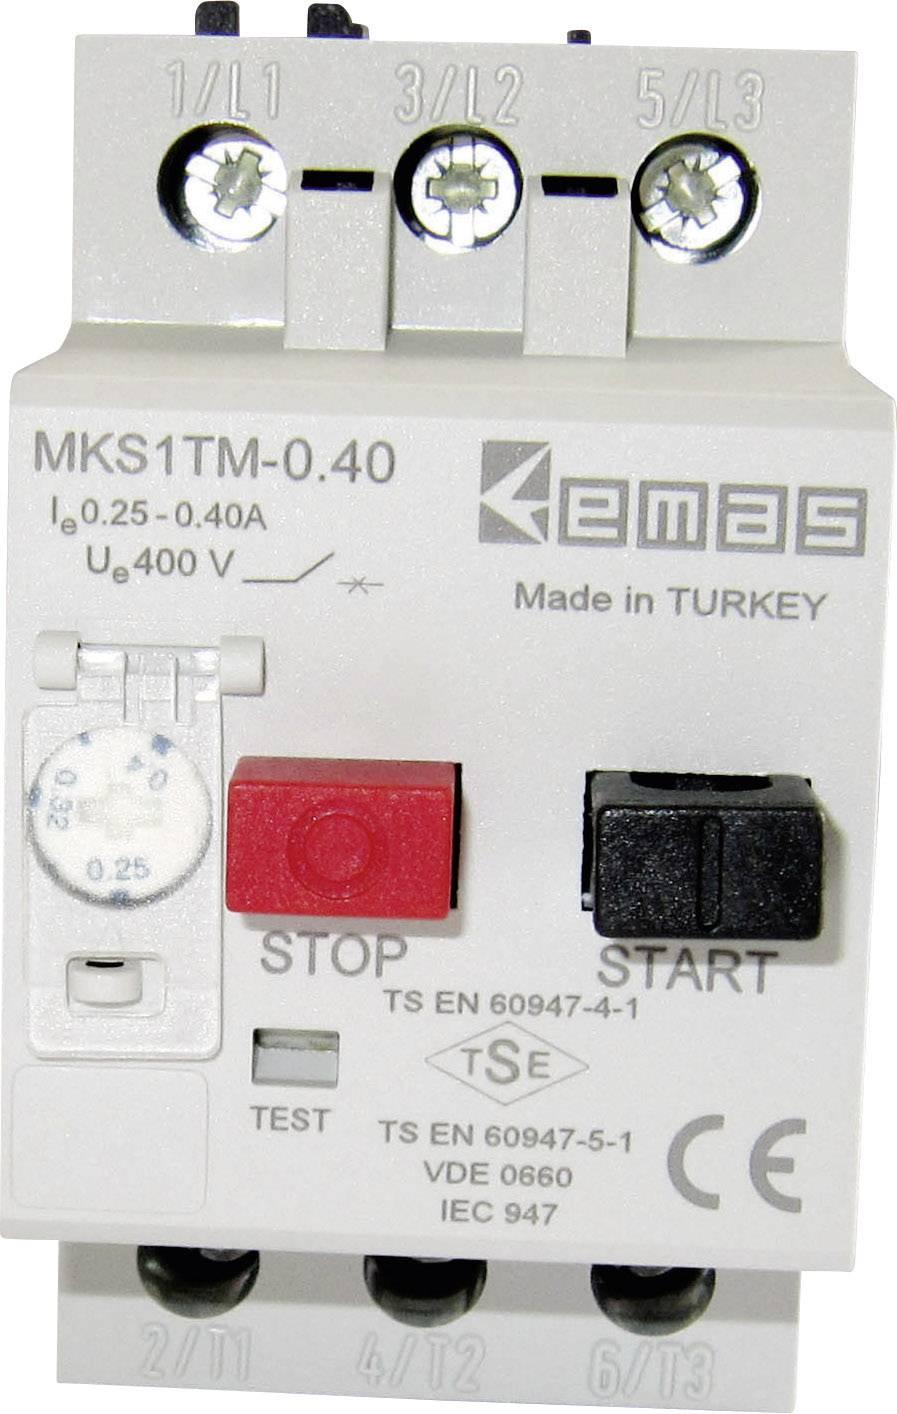 Ochranný spínač motora EMAS MKS1TM-0.40 MKS1TM-0.40, 400 V/AC, 0.4 A, 1 ks